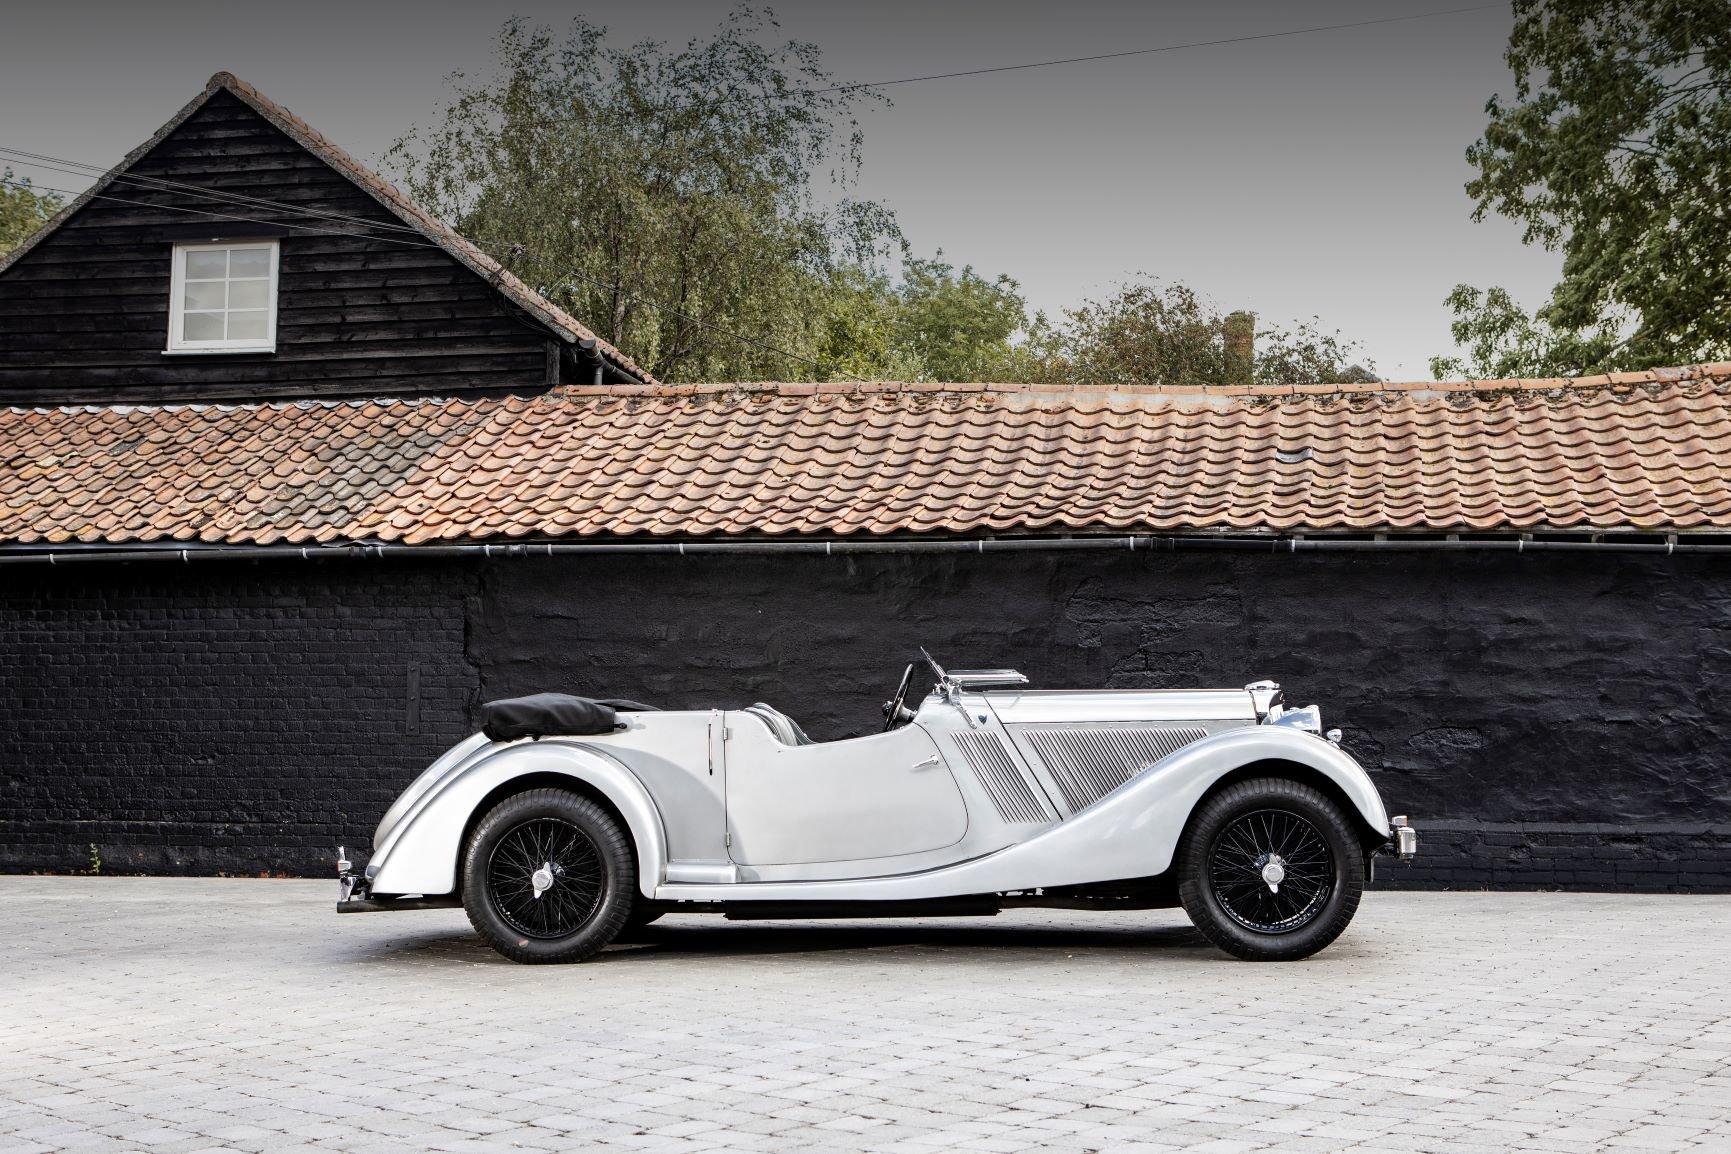 1937 Talbot BG110 Sports Tourer by Vanden Plas For Sale (picture 2 of 6)